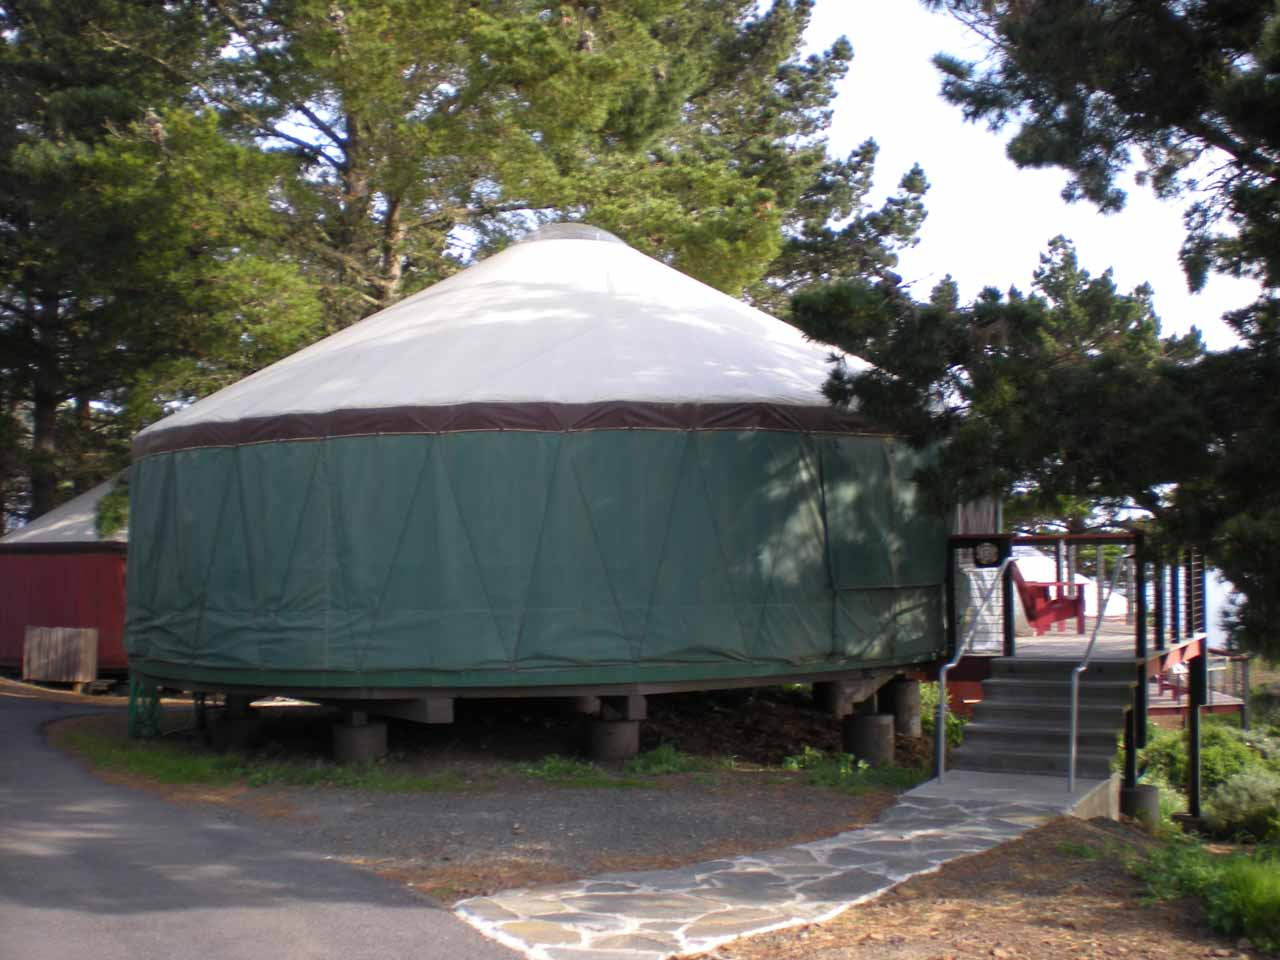 A yurt at Treebones